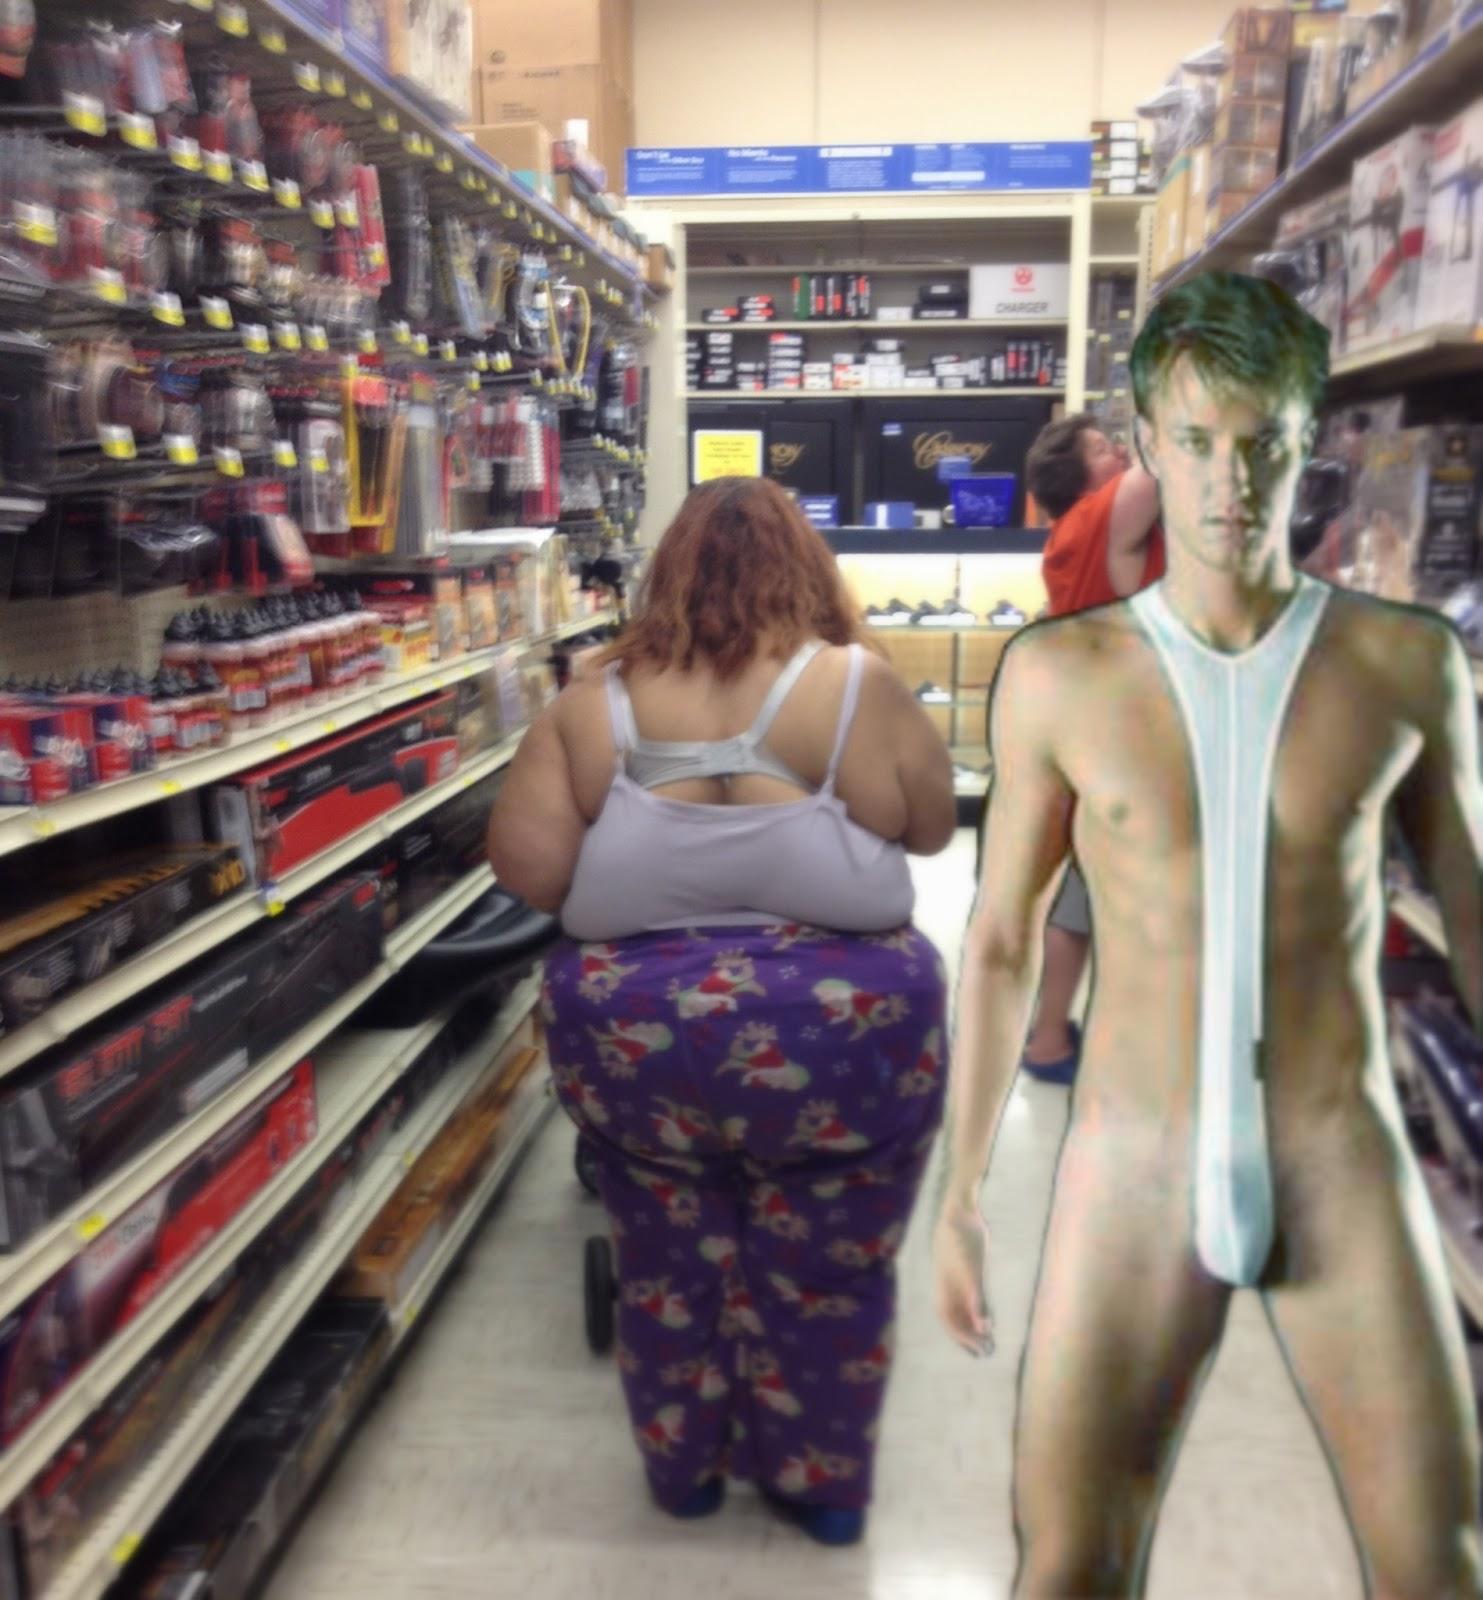 wife caught nude in public